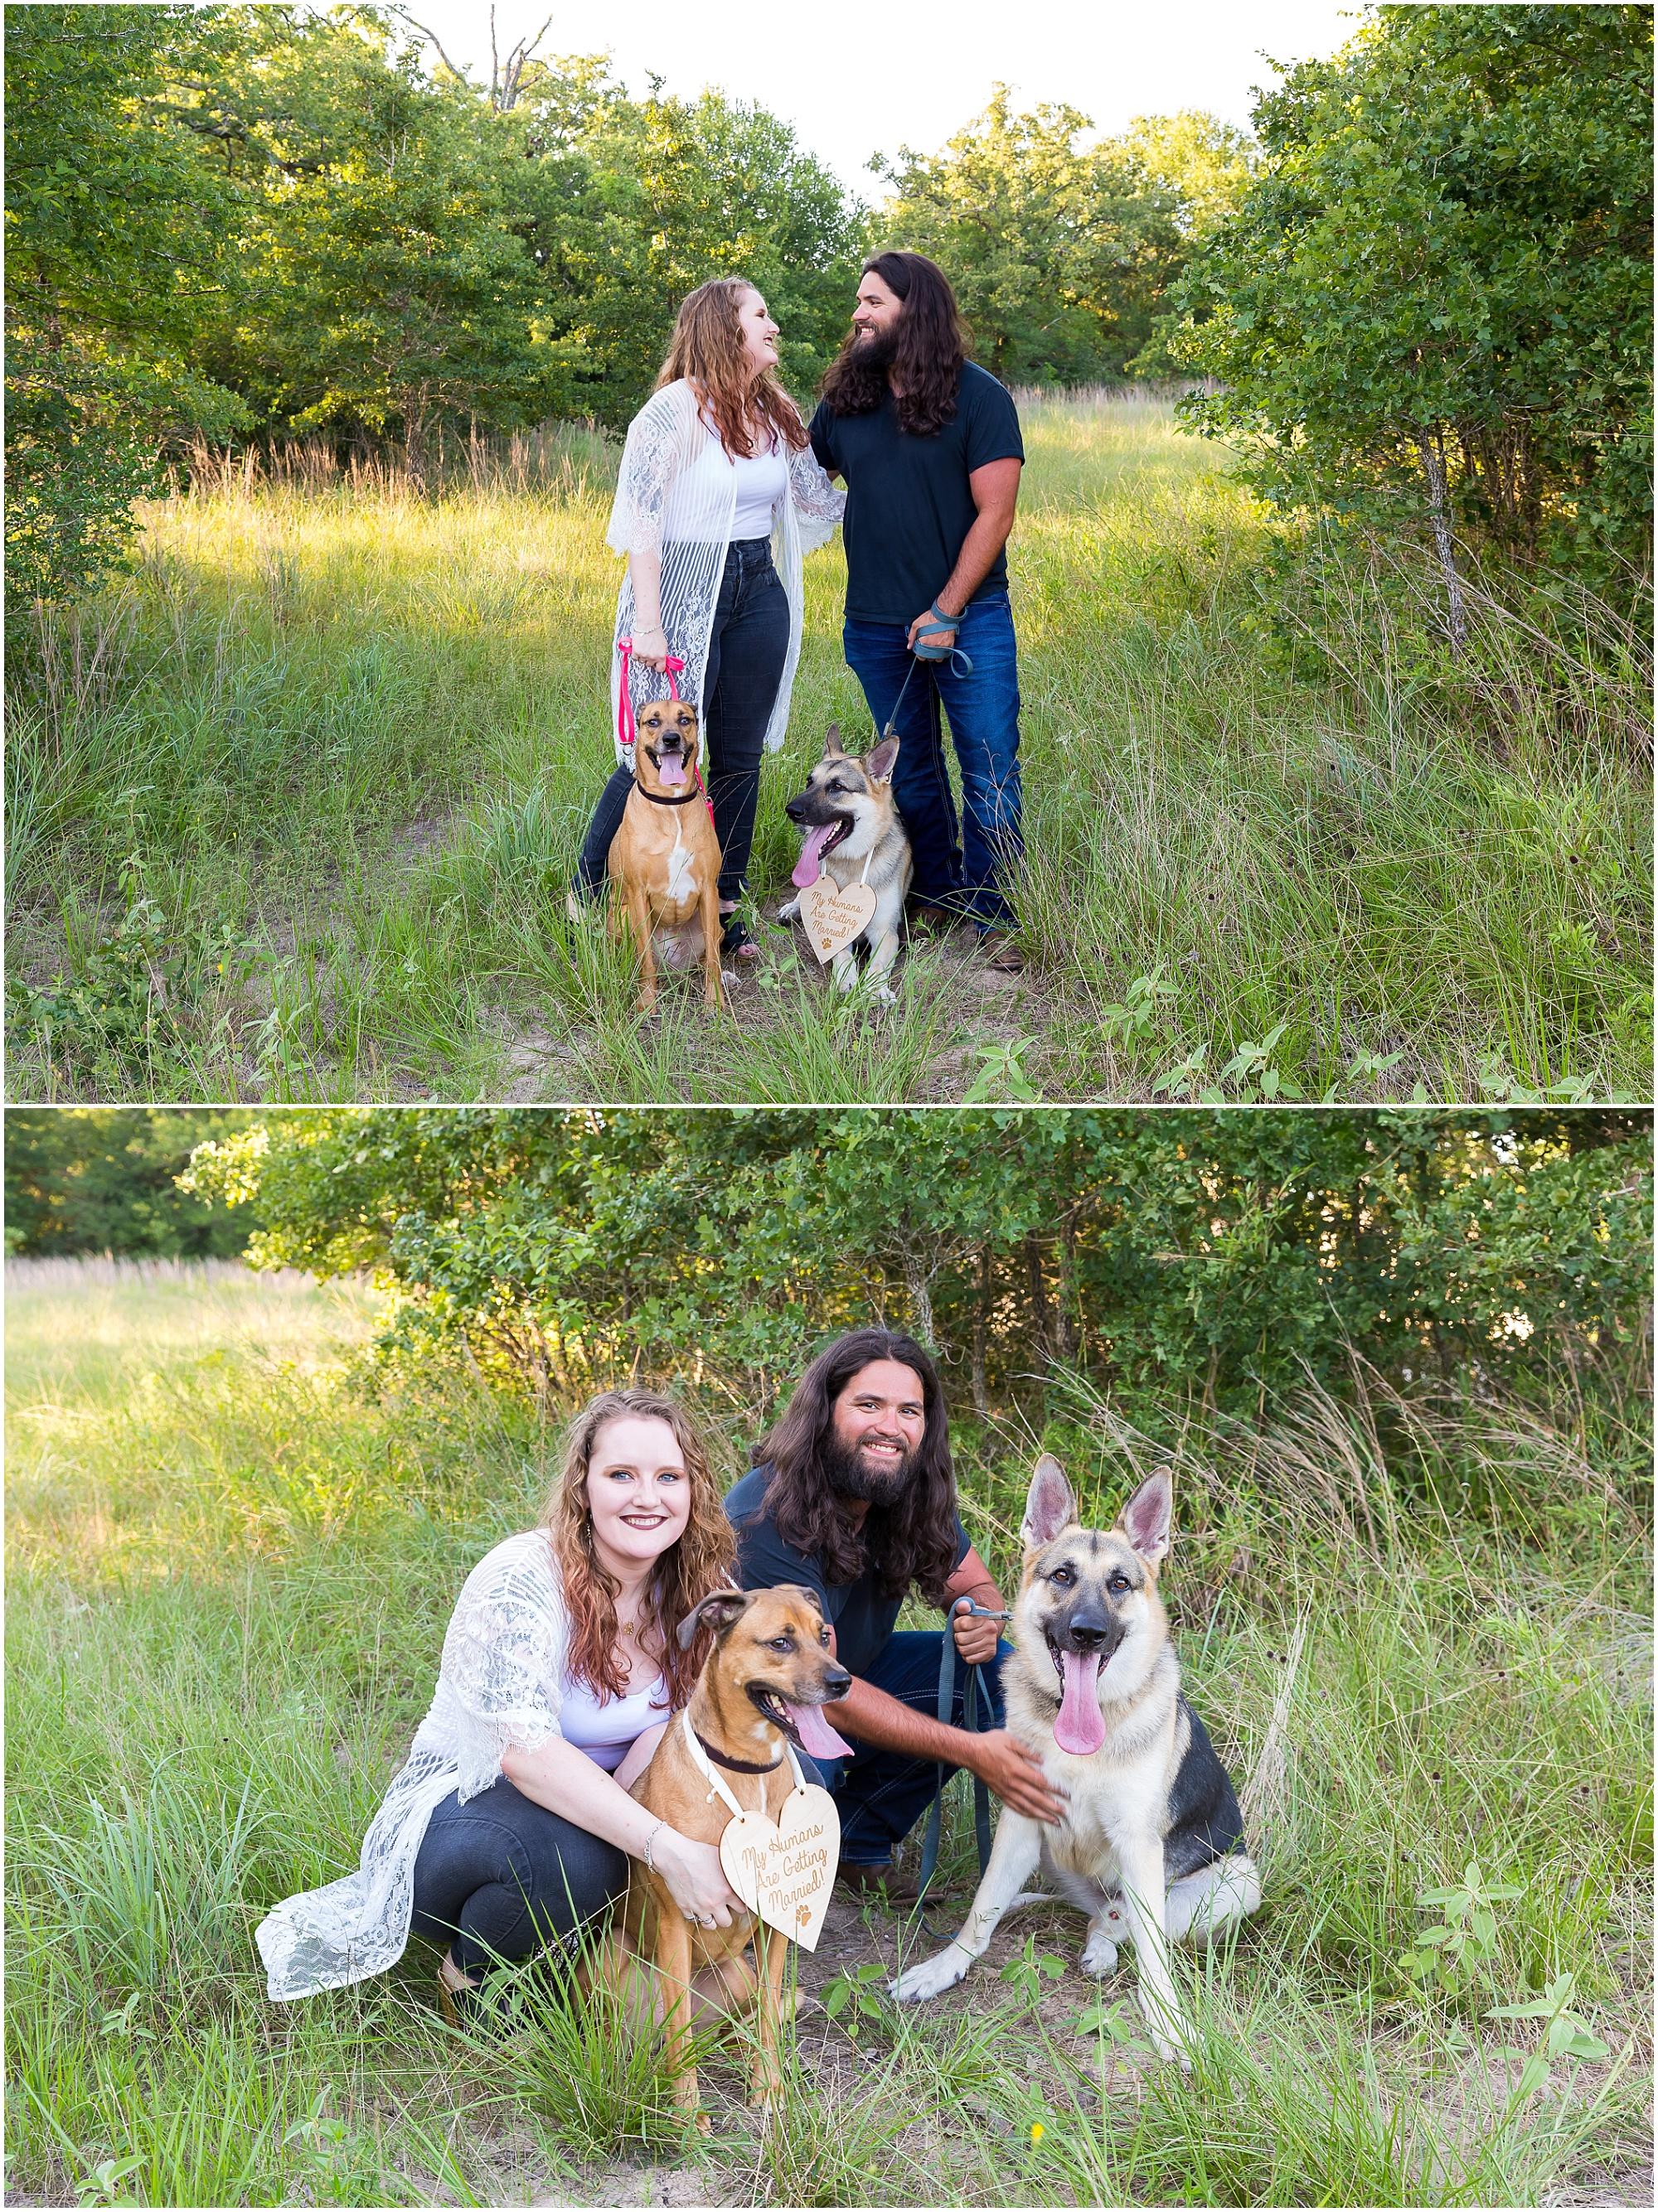 An engagement session with dogs in College Station, Texas - Jason & Melaina Photography - www.jasonandmelaina.com